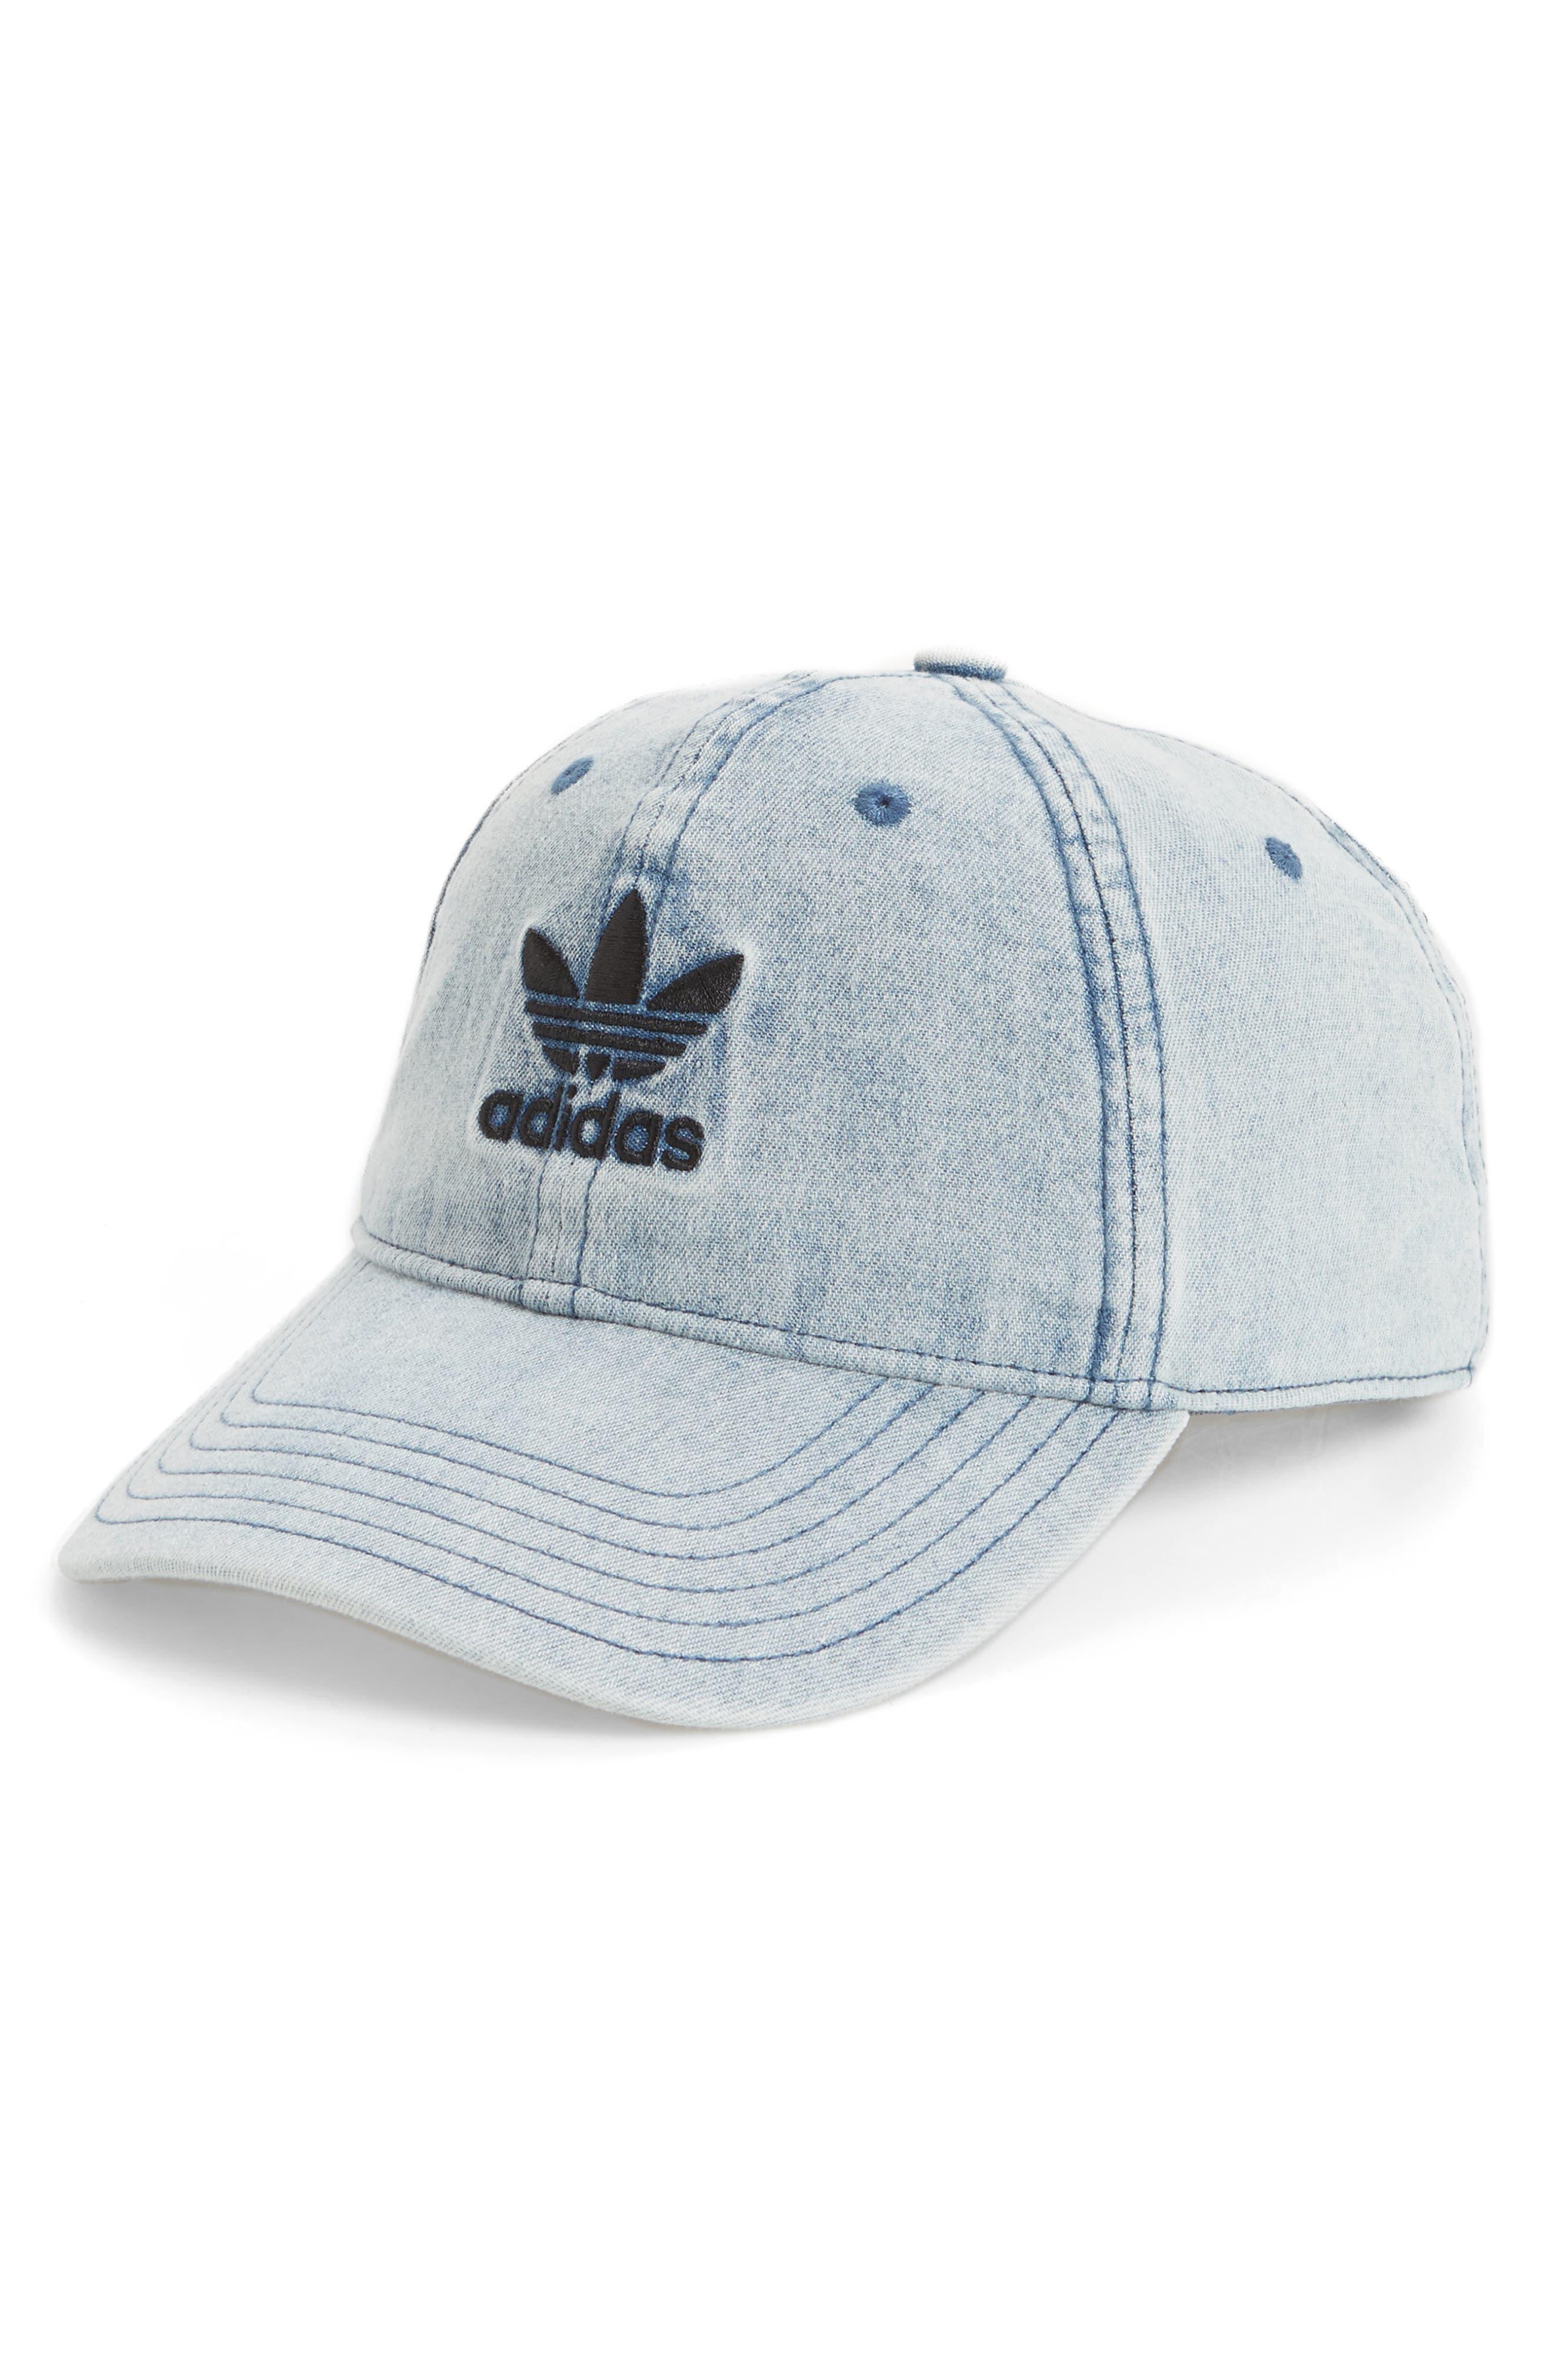 adidas Originals Denim Baseball Cap